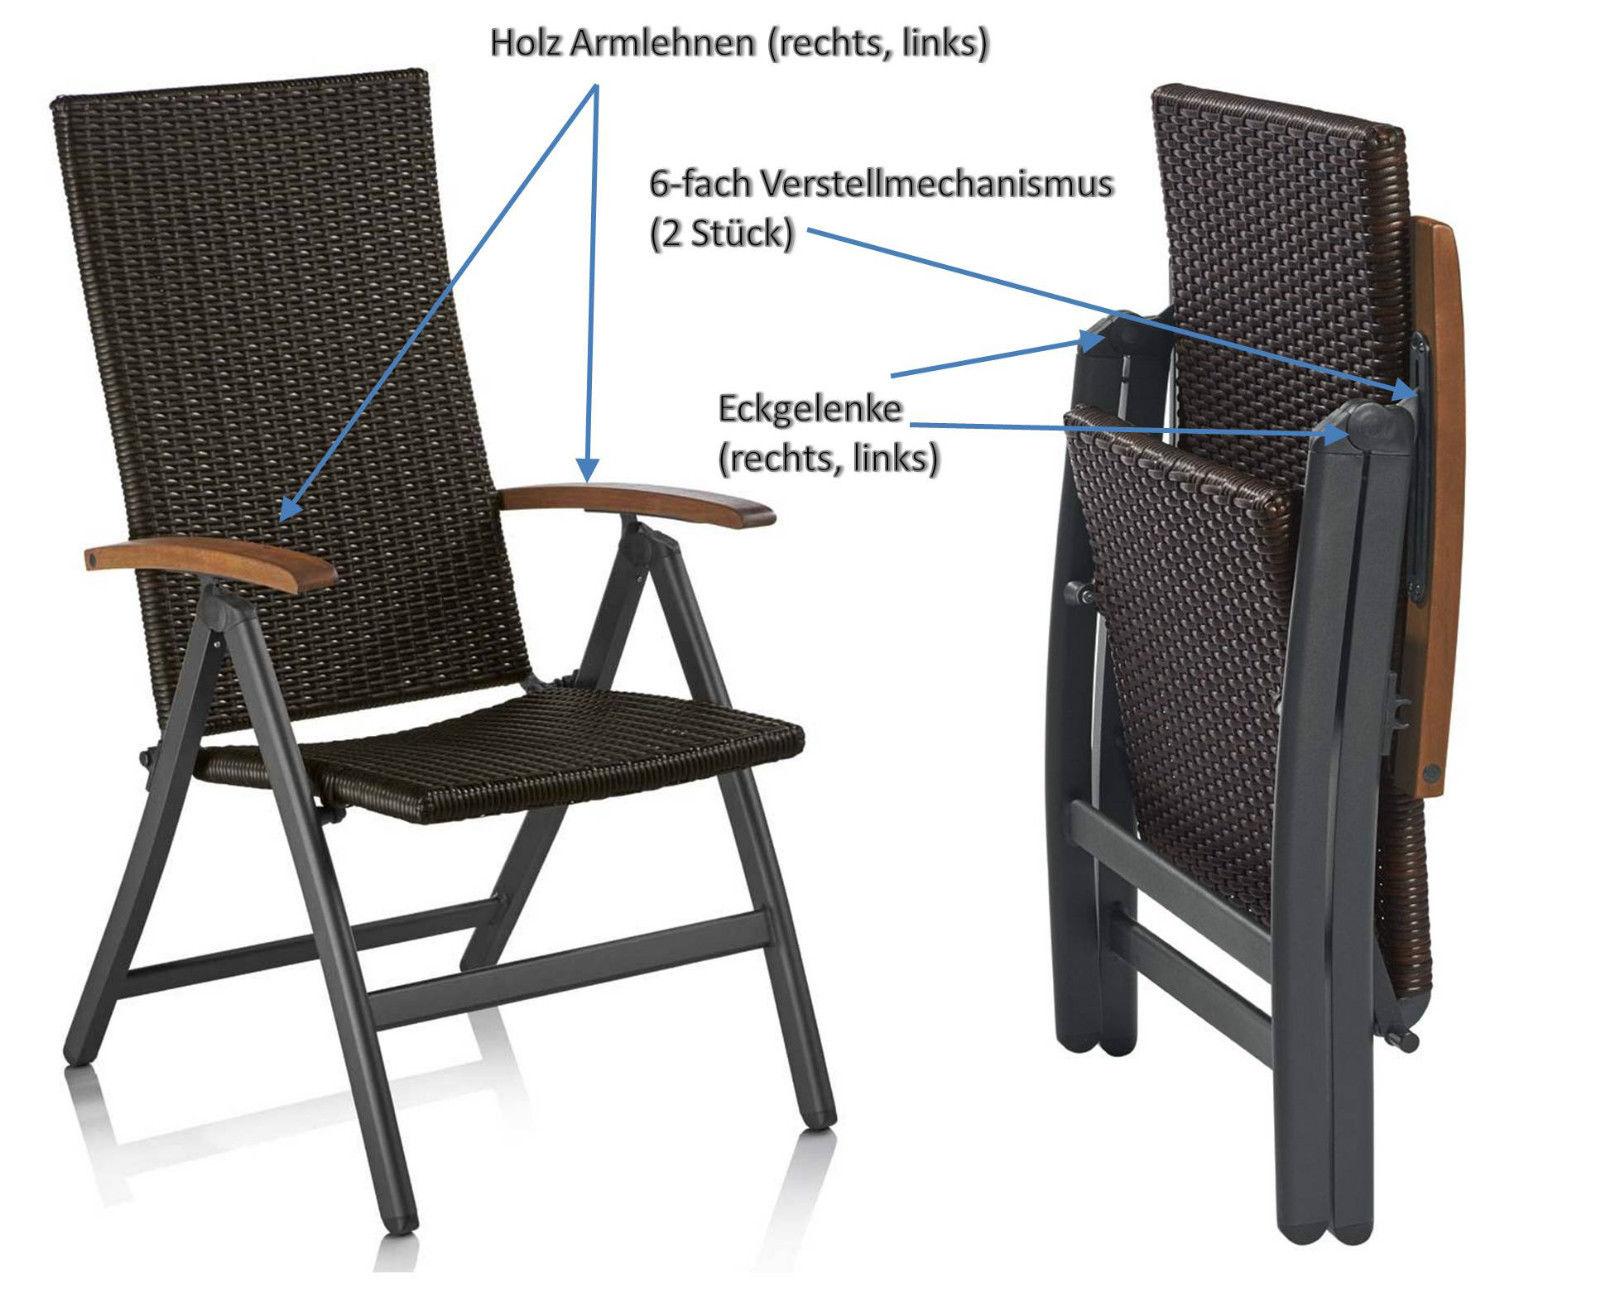 florabest klapp-sessel ersatzteile | klappstuhl armlehne polyrattan